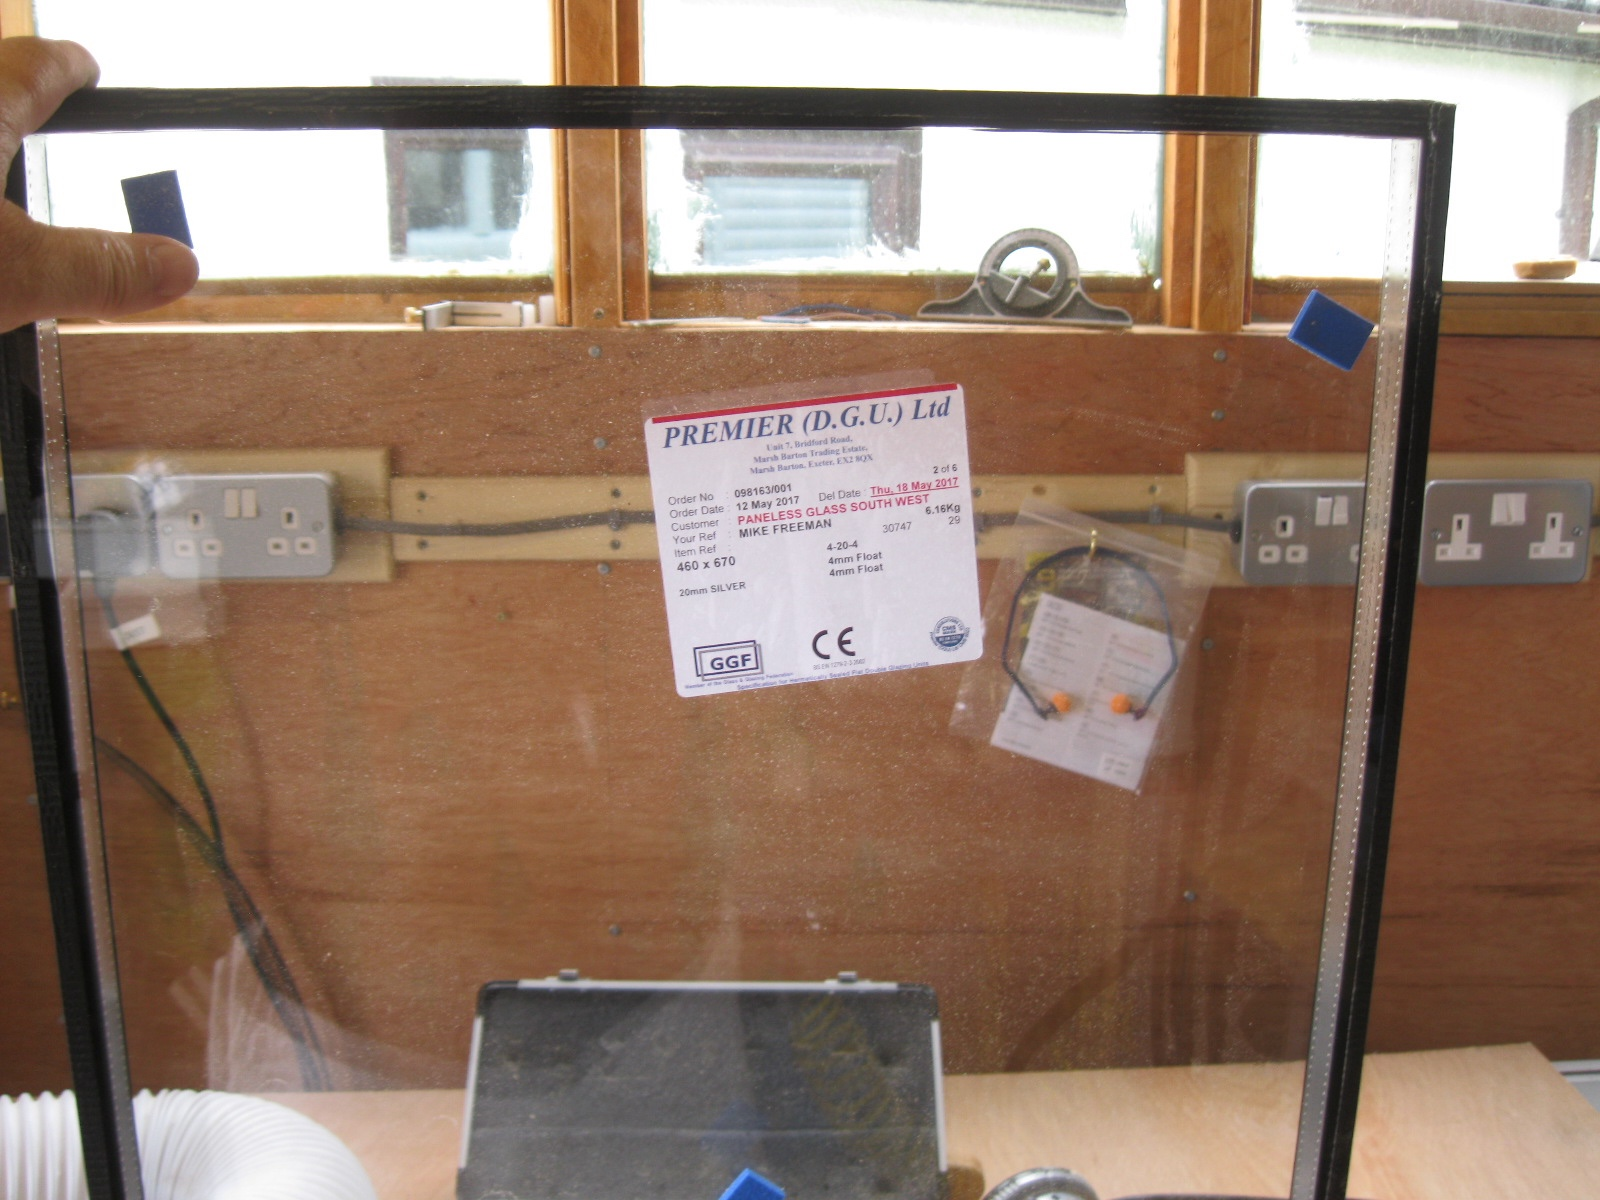 Double glazed replacement unit